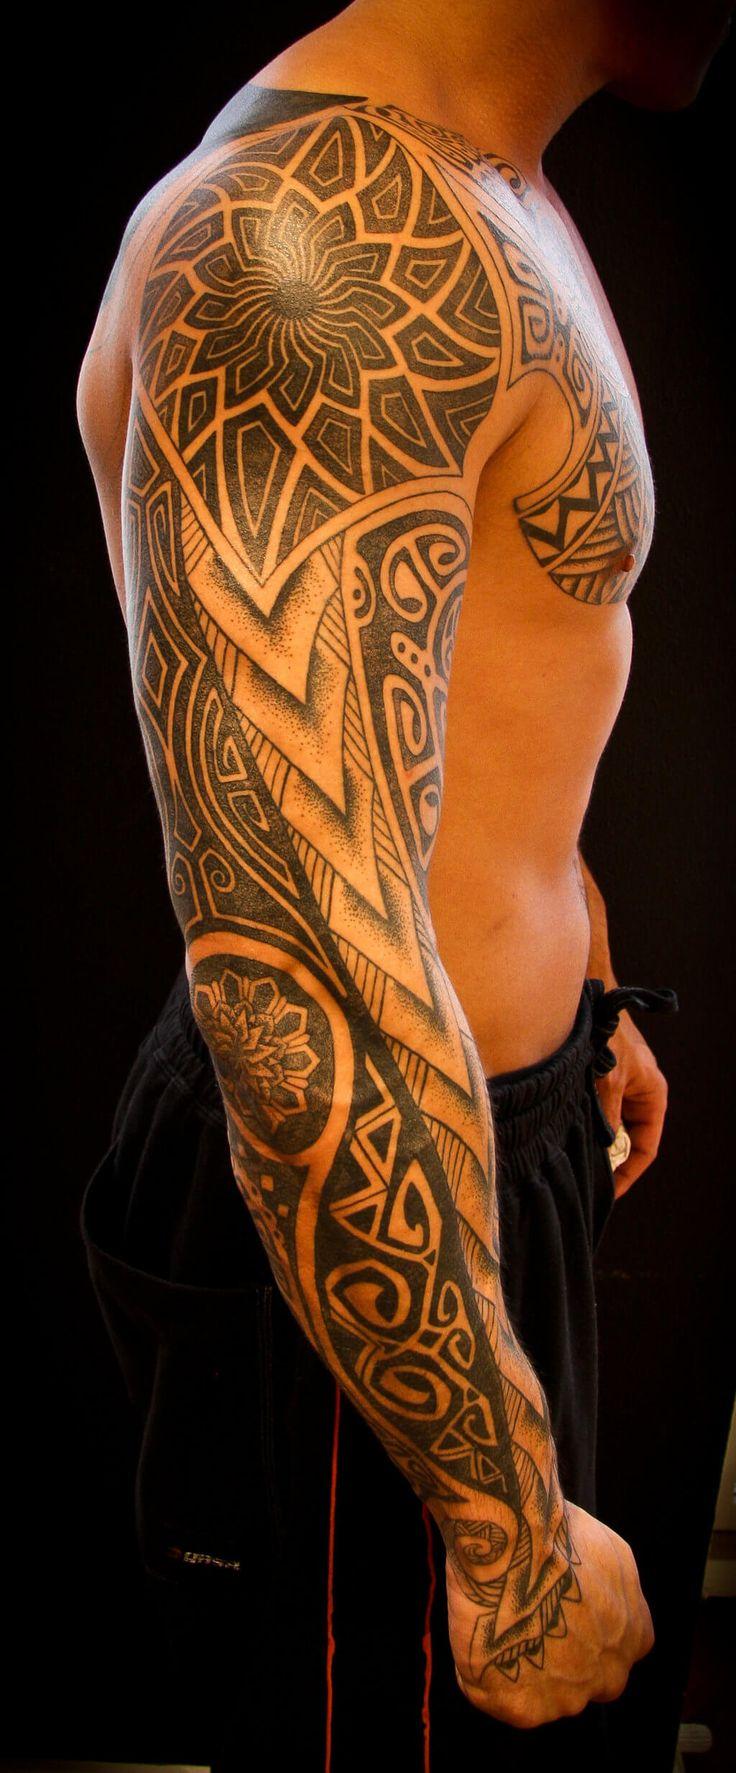 Polynesian Tattoo Designs and Ideas